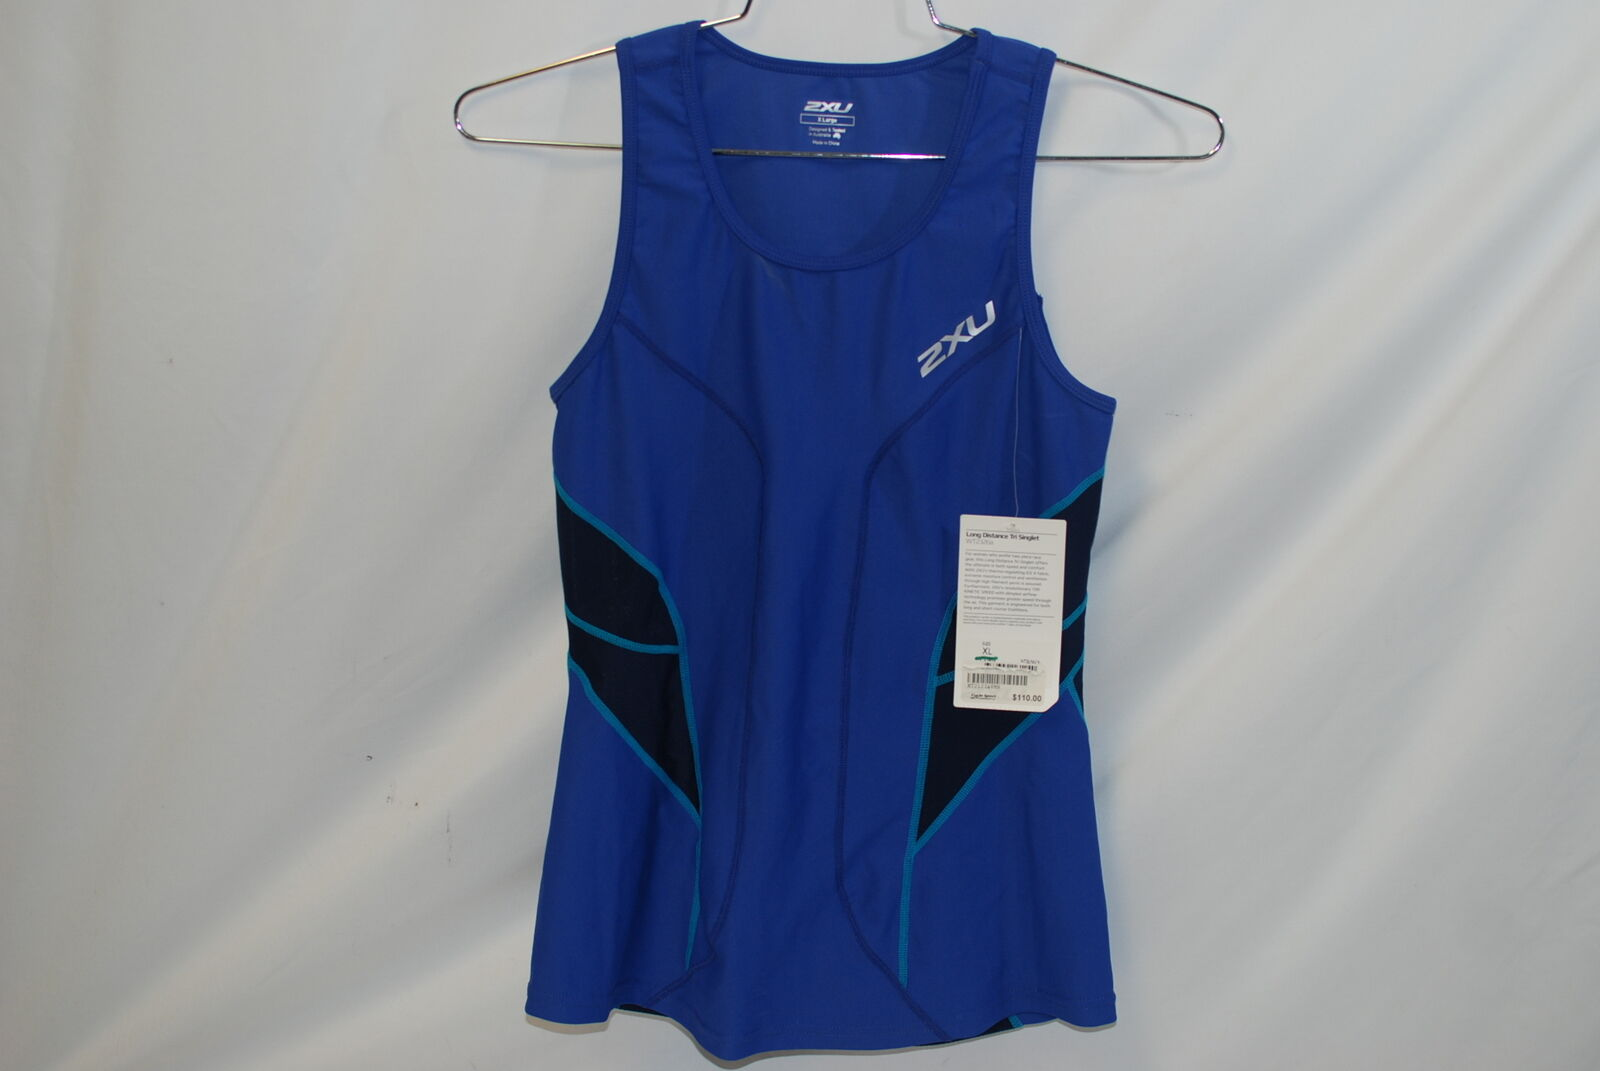 2XU Cycling Womens  Long Distance Tri Singlet bluee Navy XL  clearance